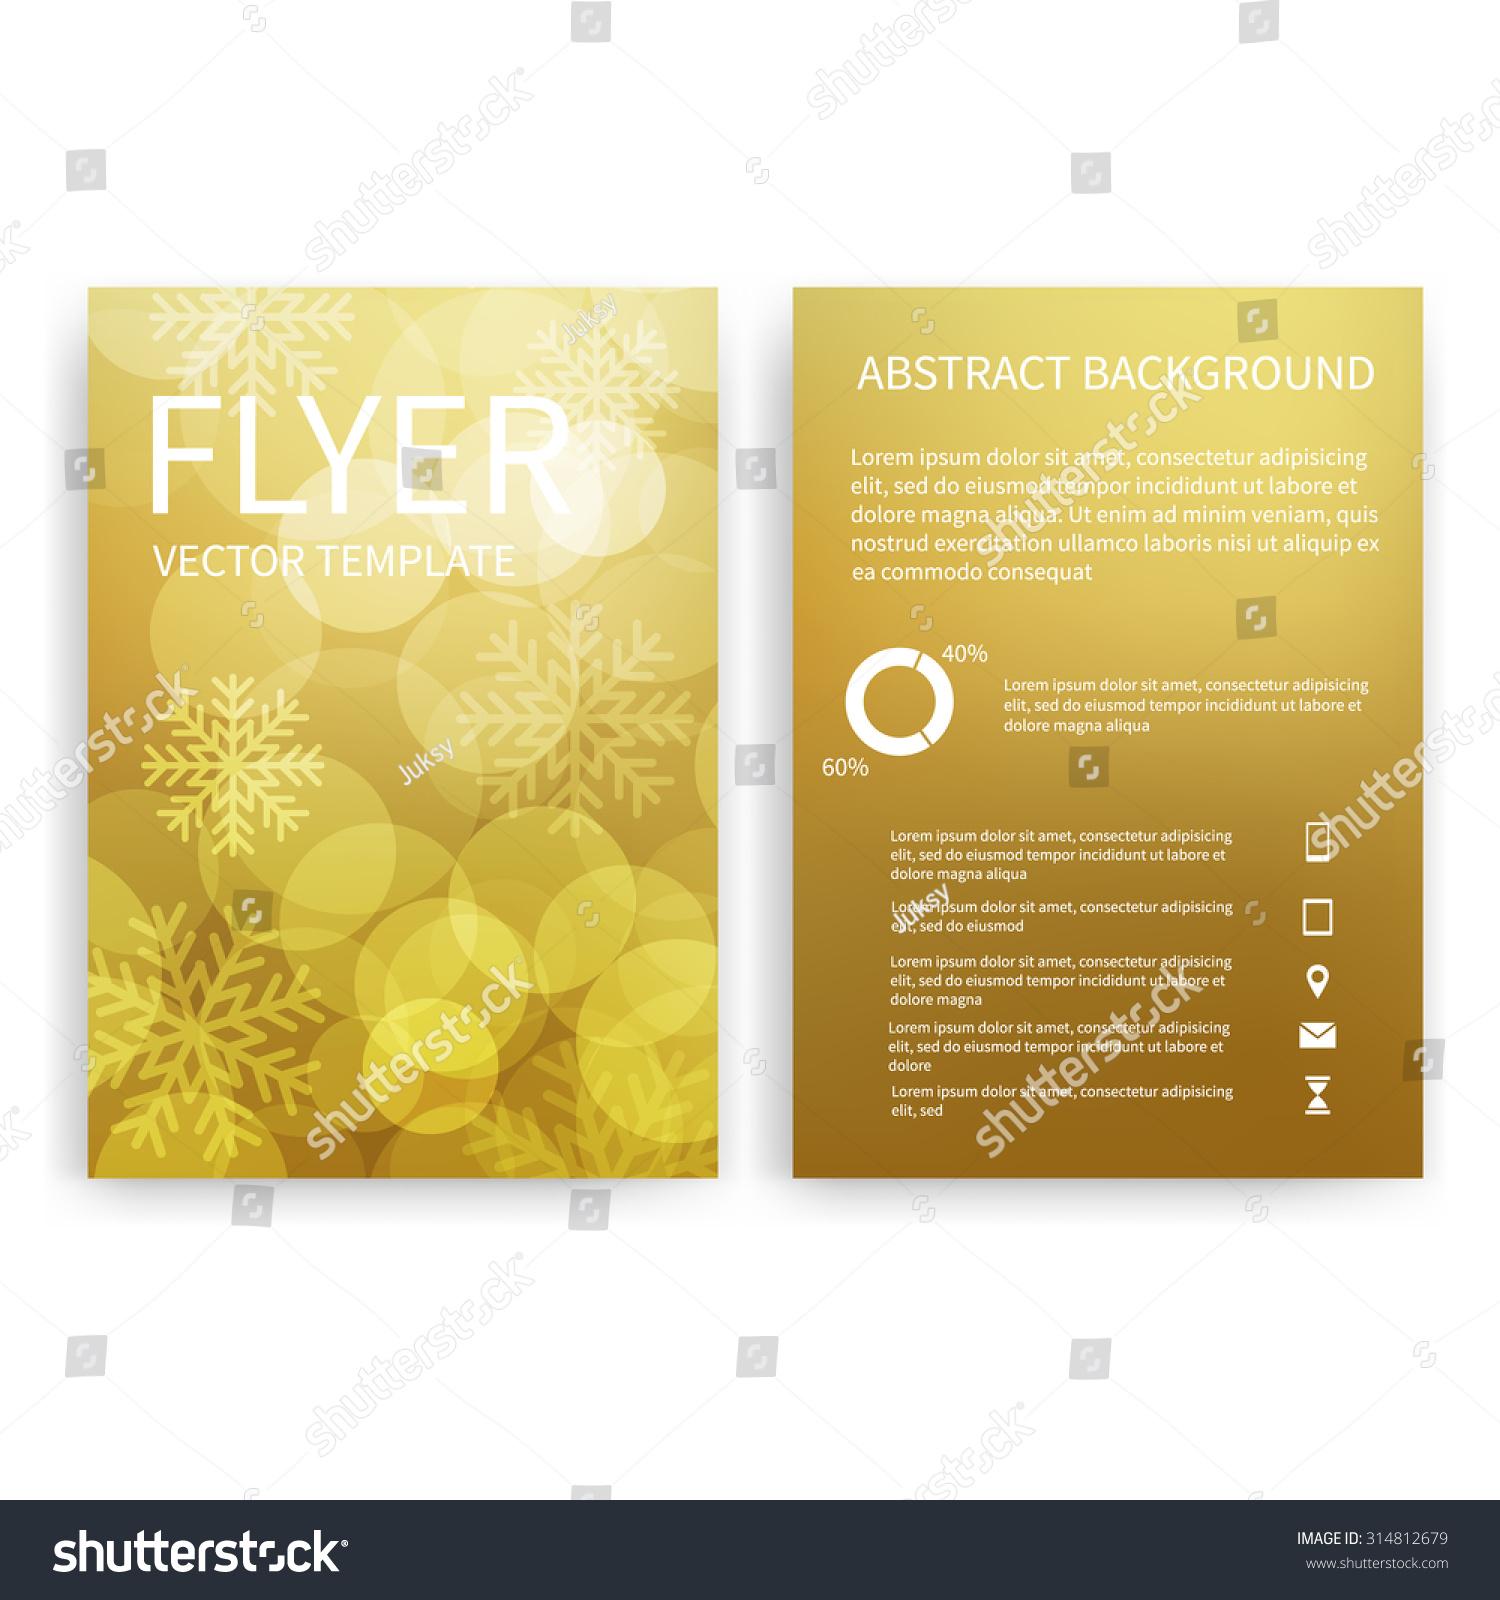 christmas flyer design templates set gold stock vector  christmas flyer design templates set of gold a4 brochure design templates bokeh lights and